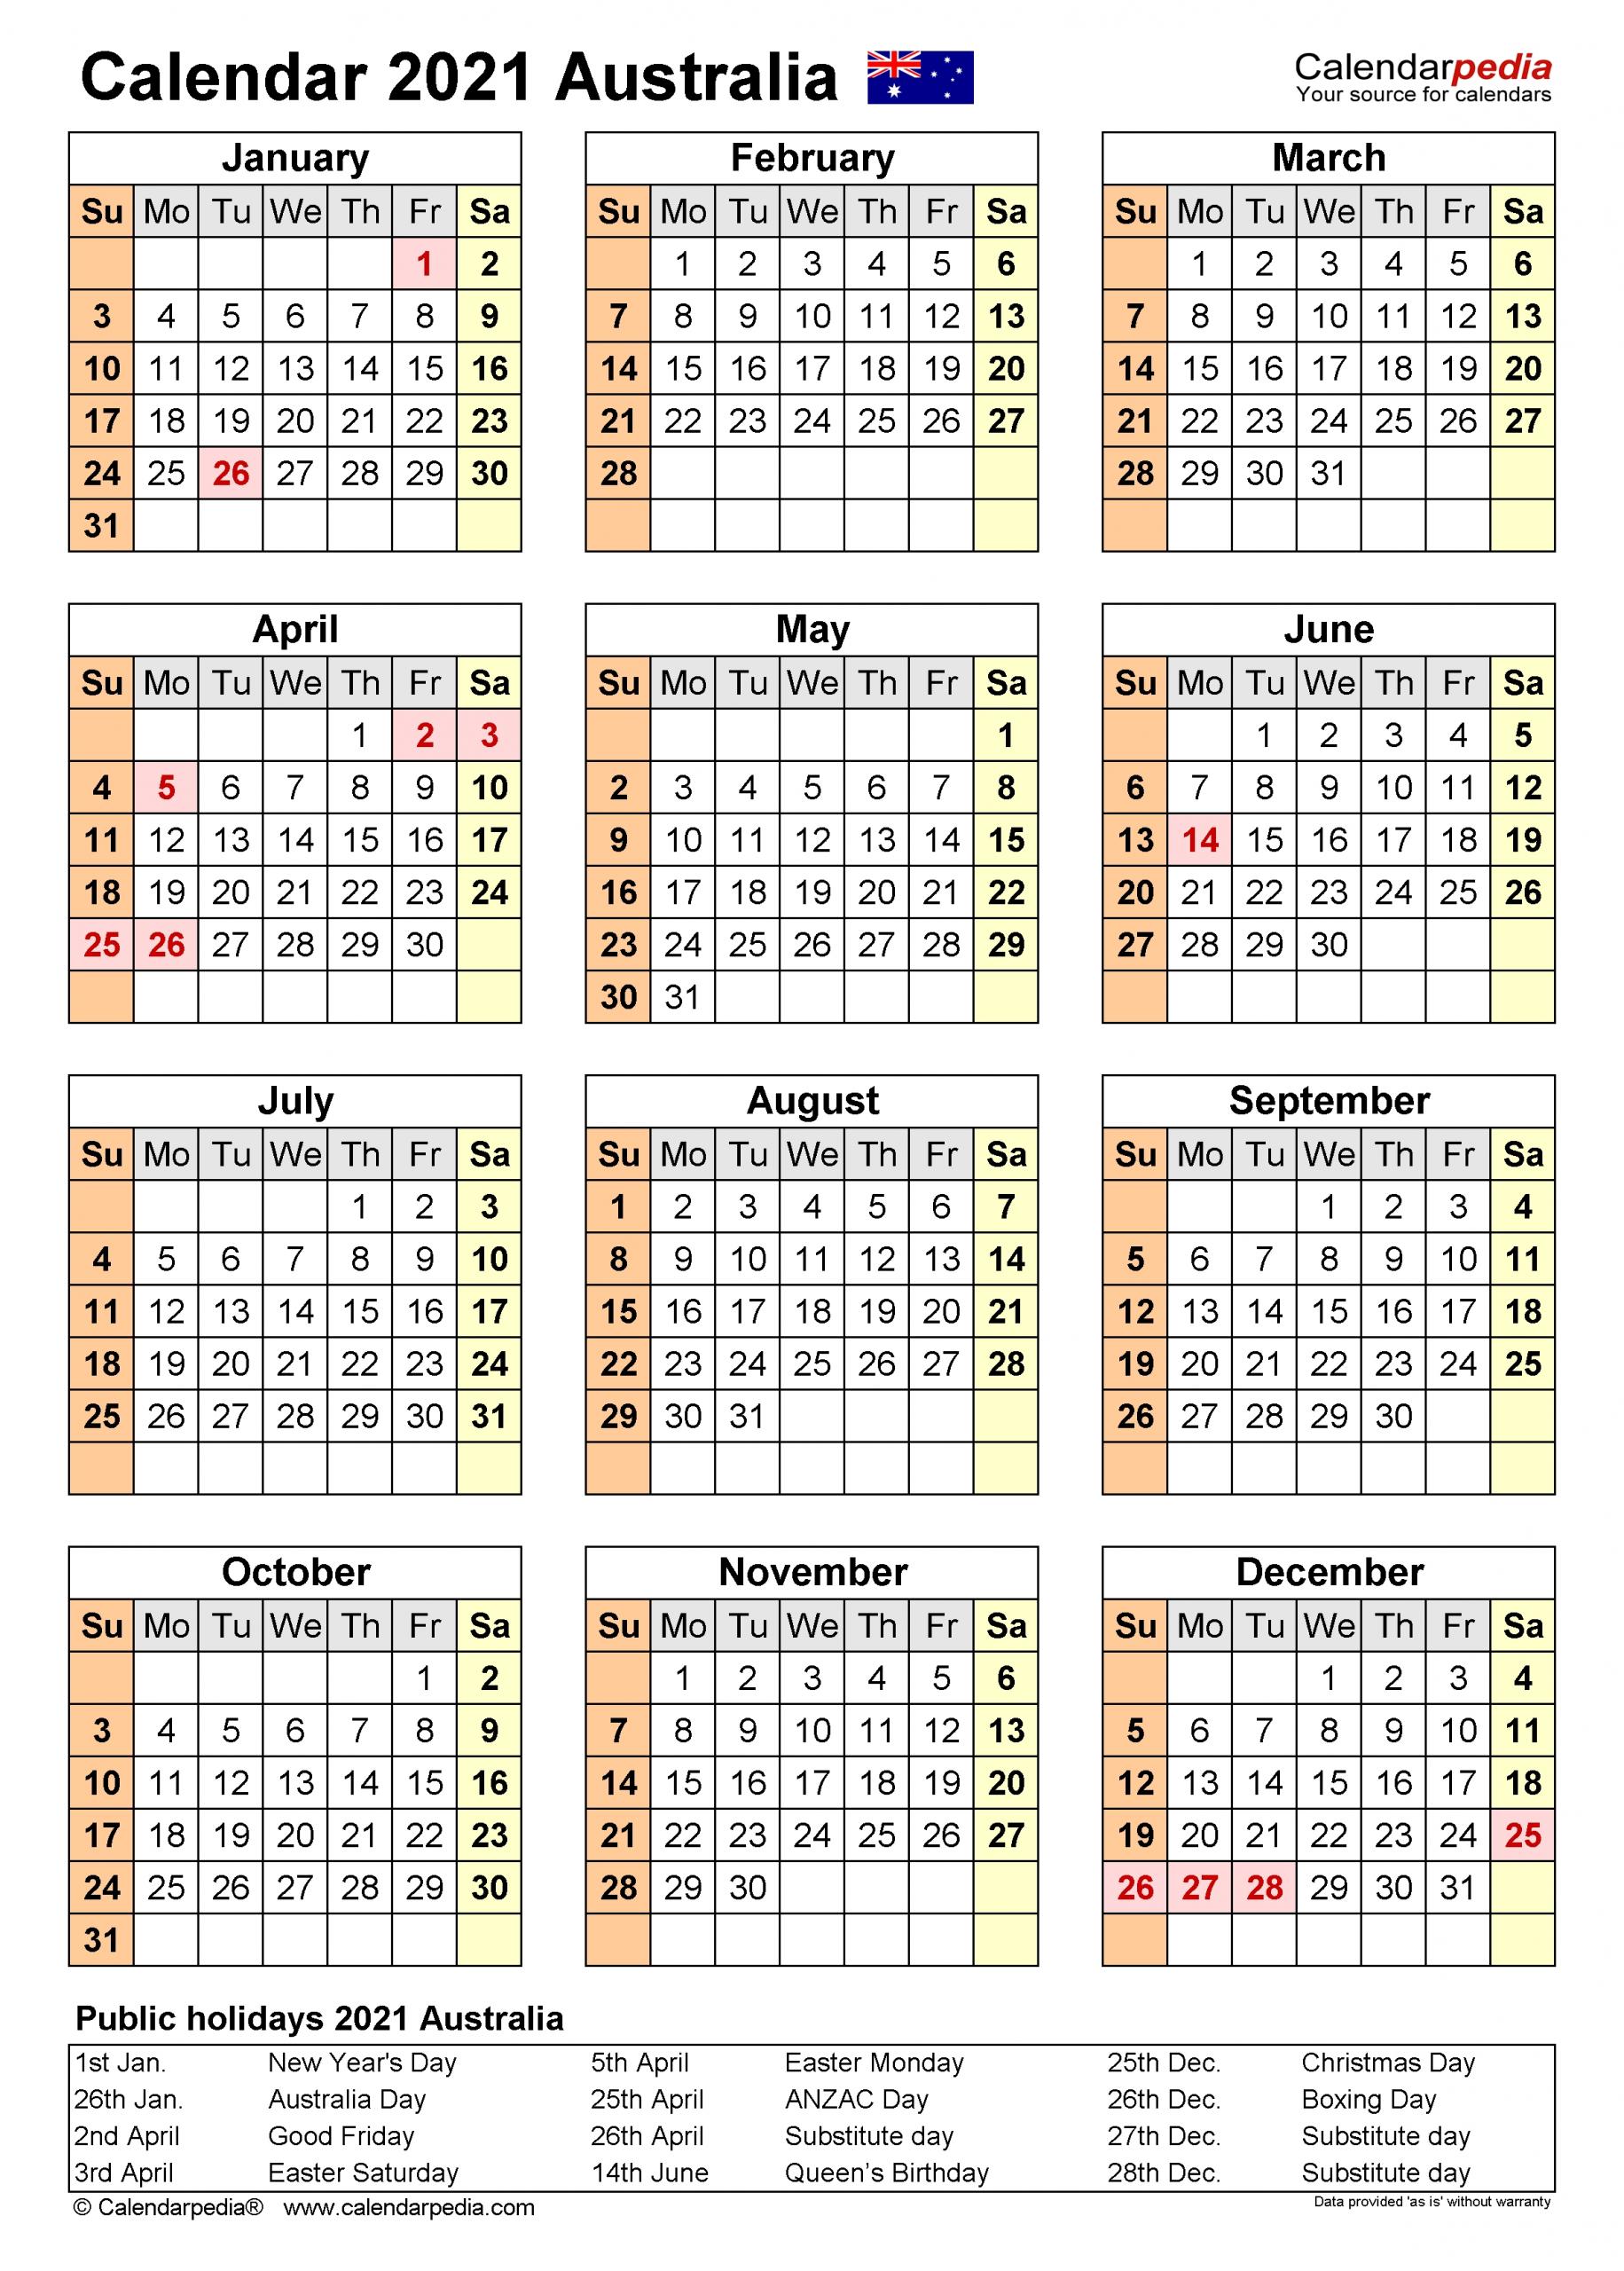 Australia Calendar 2021 - Free Printable Word Templates  Financial Year 2021 19 Australia